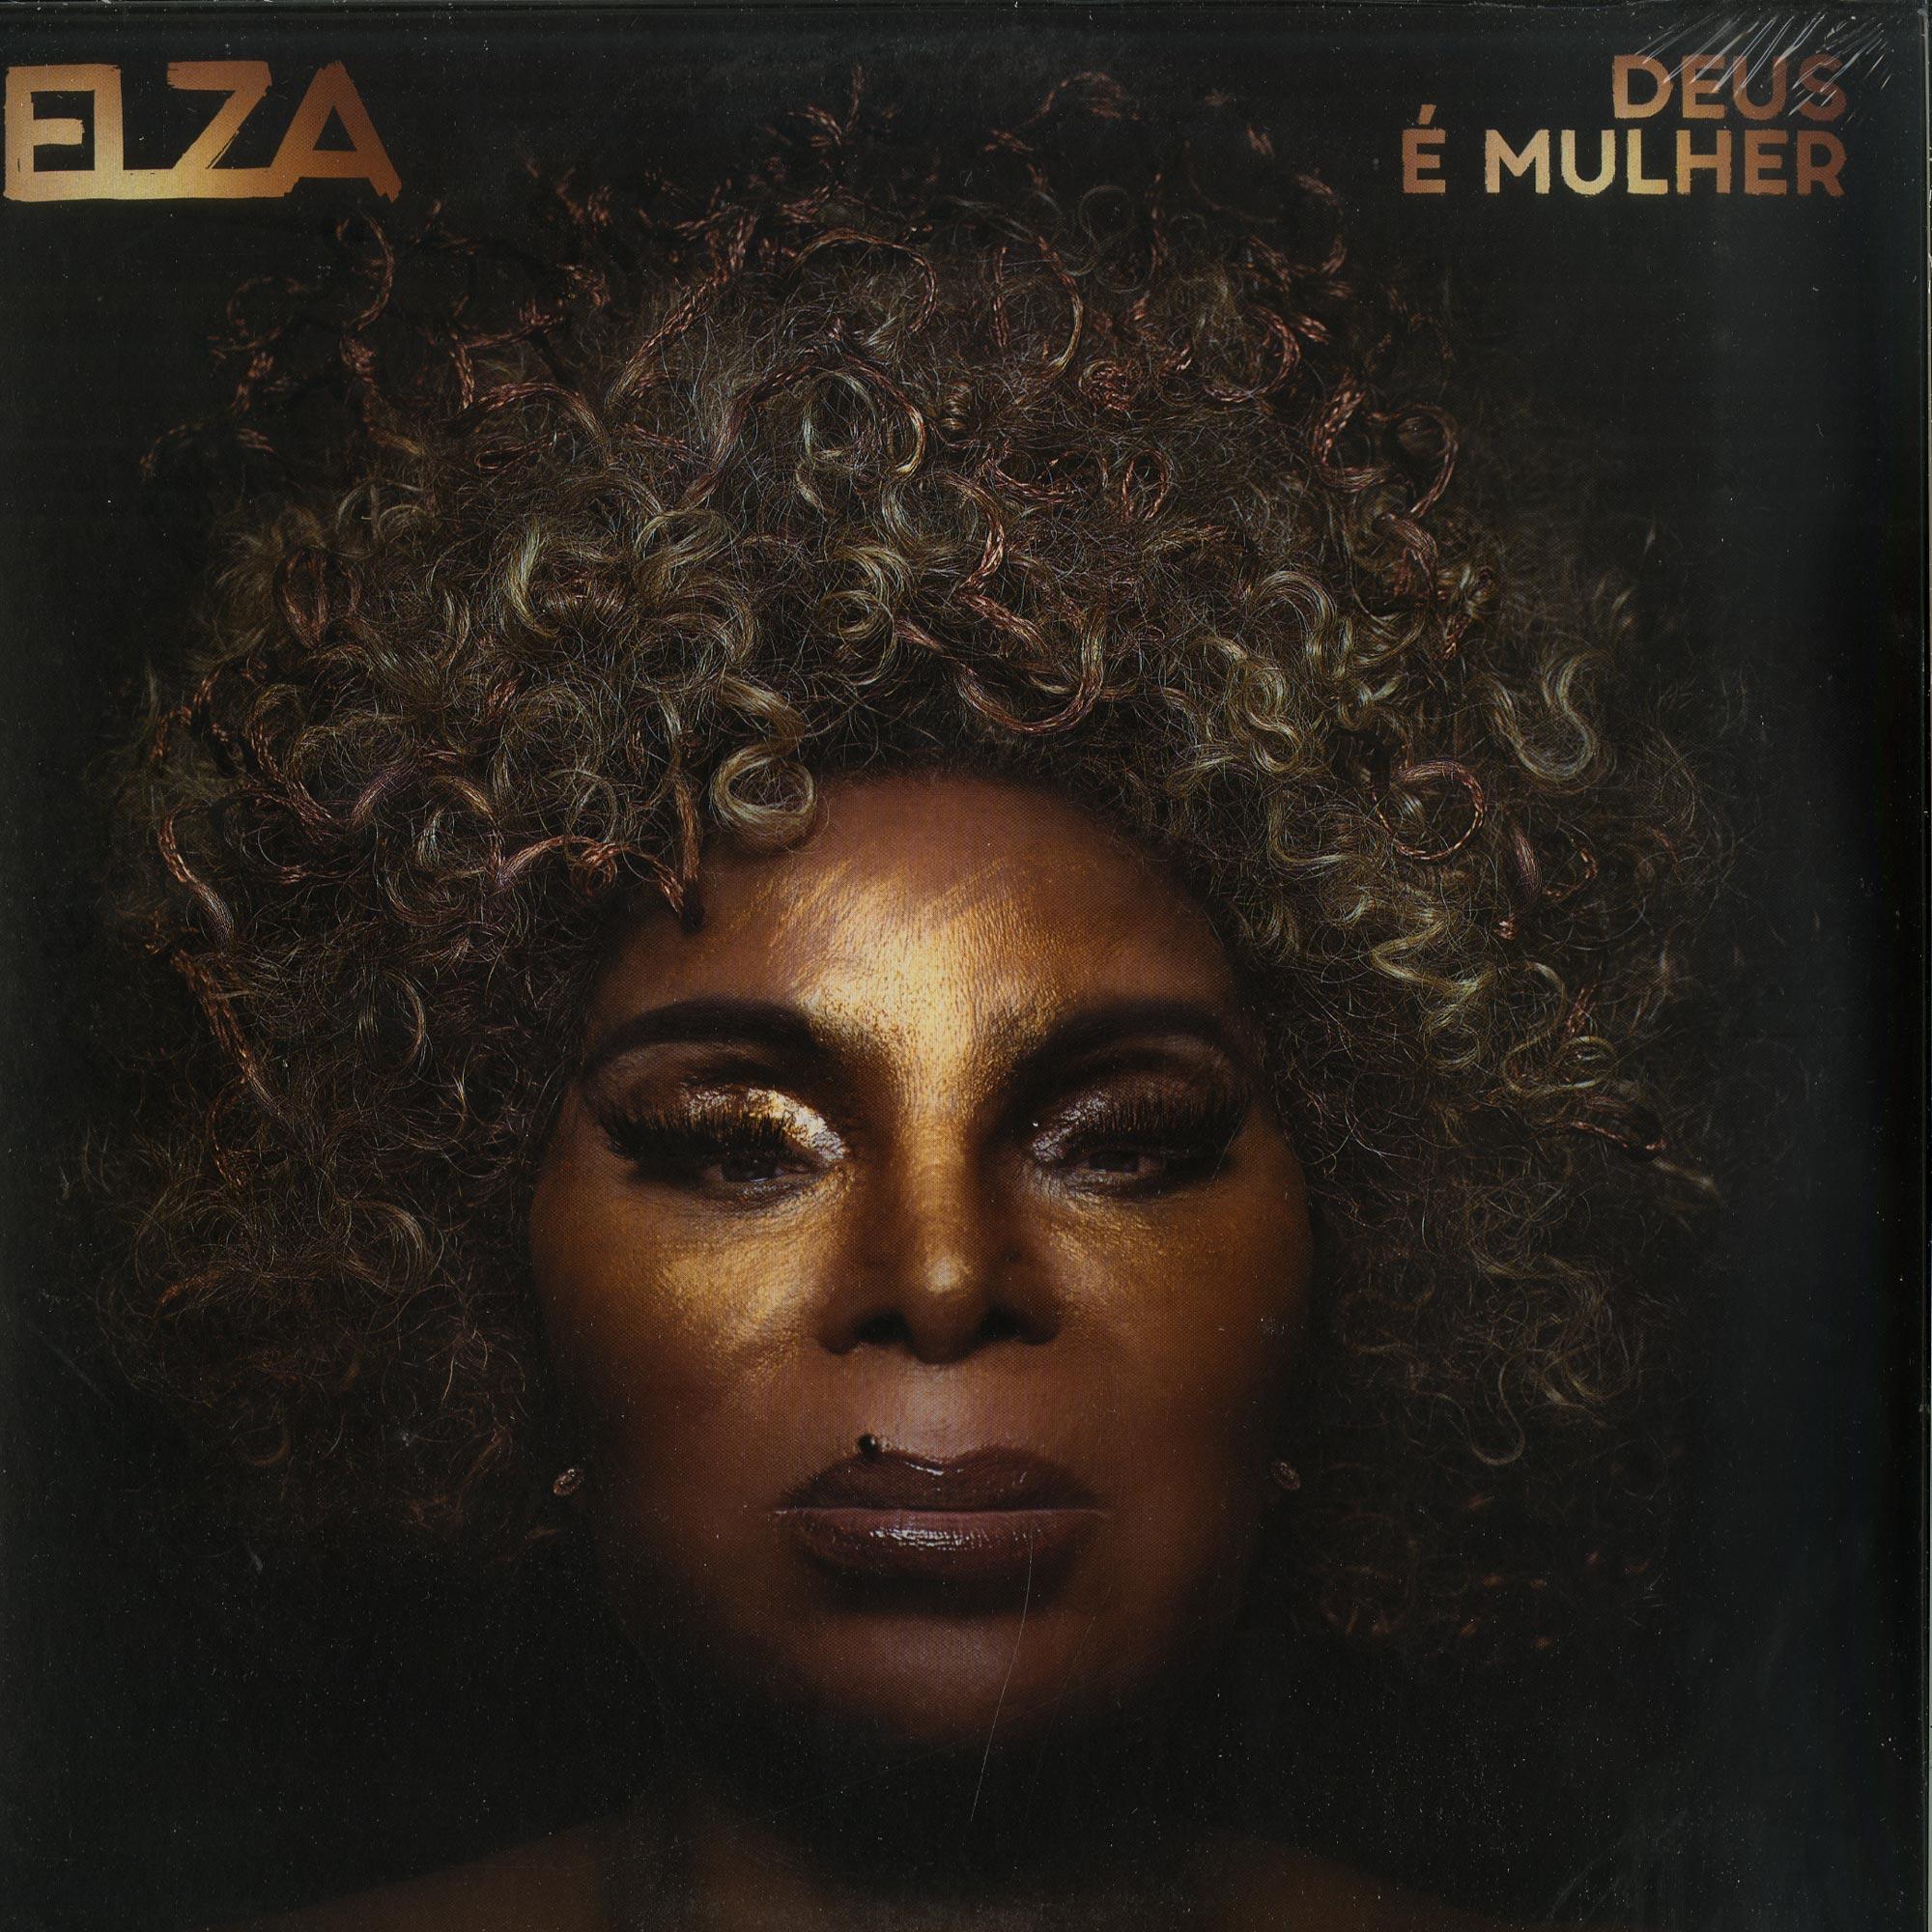 Elza Soares - DEUS E MULHER